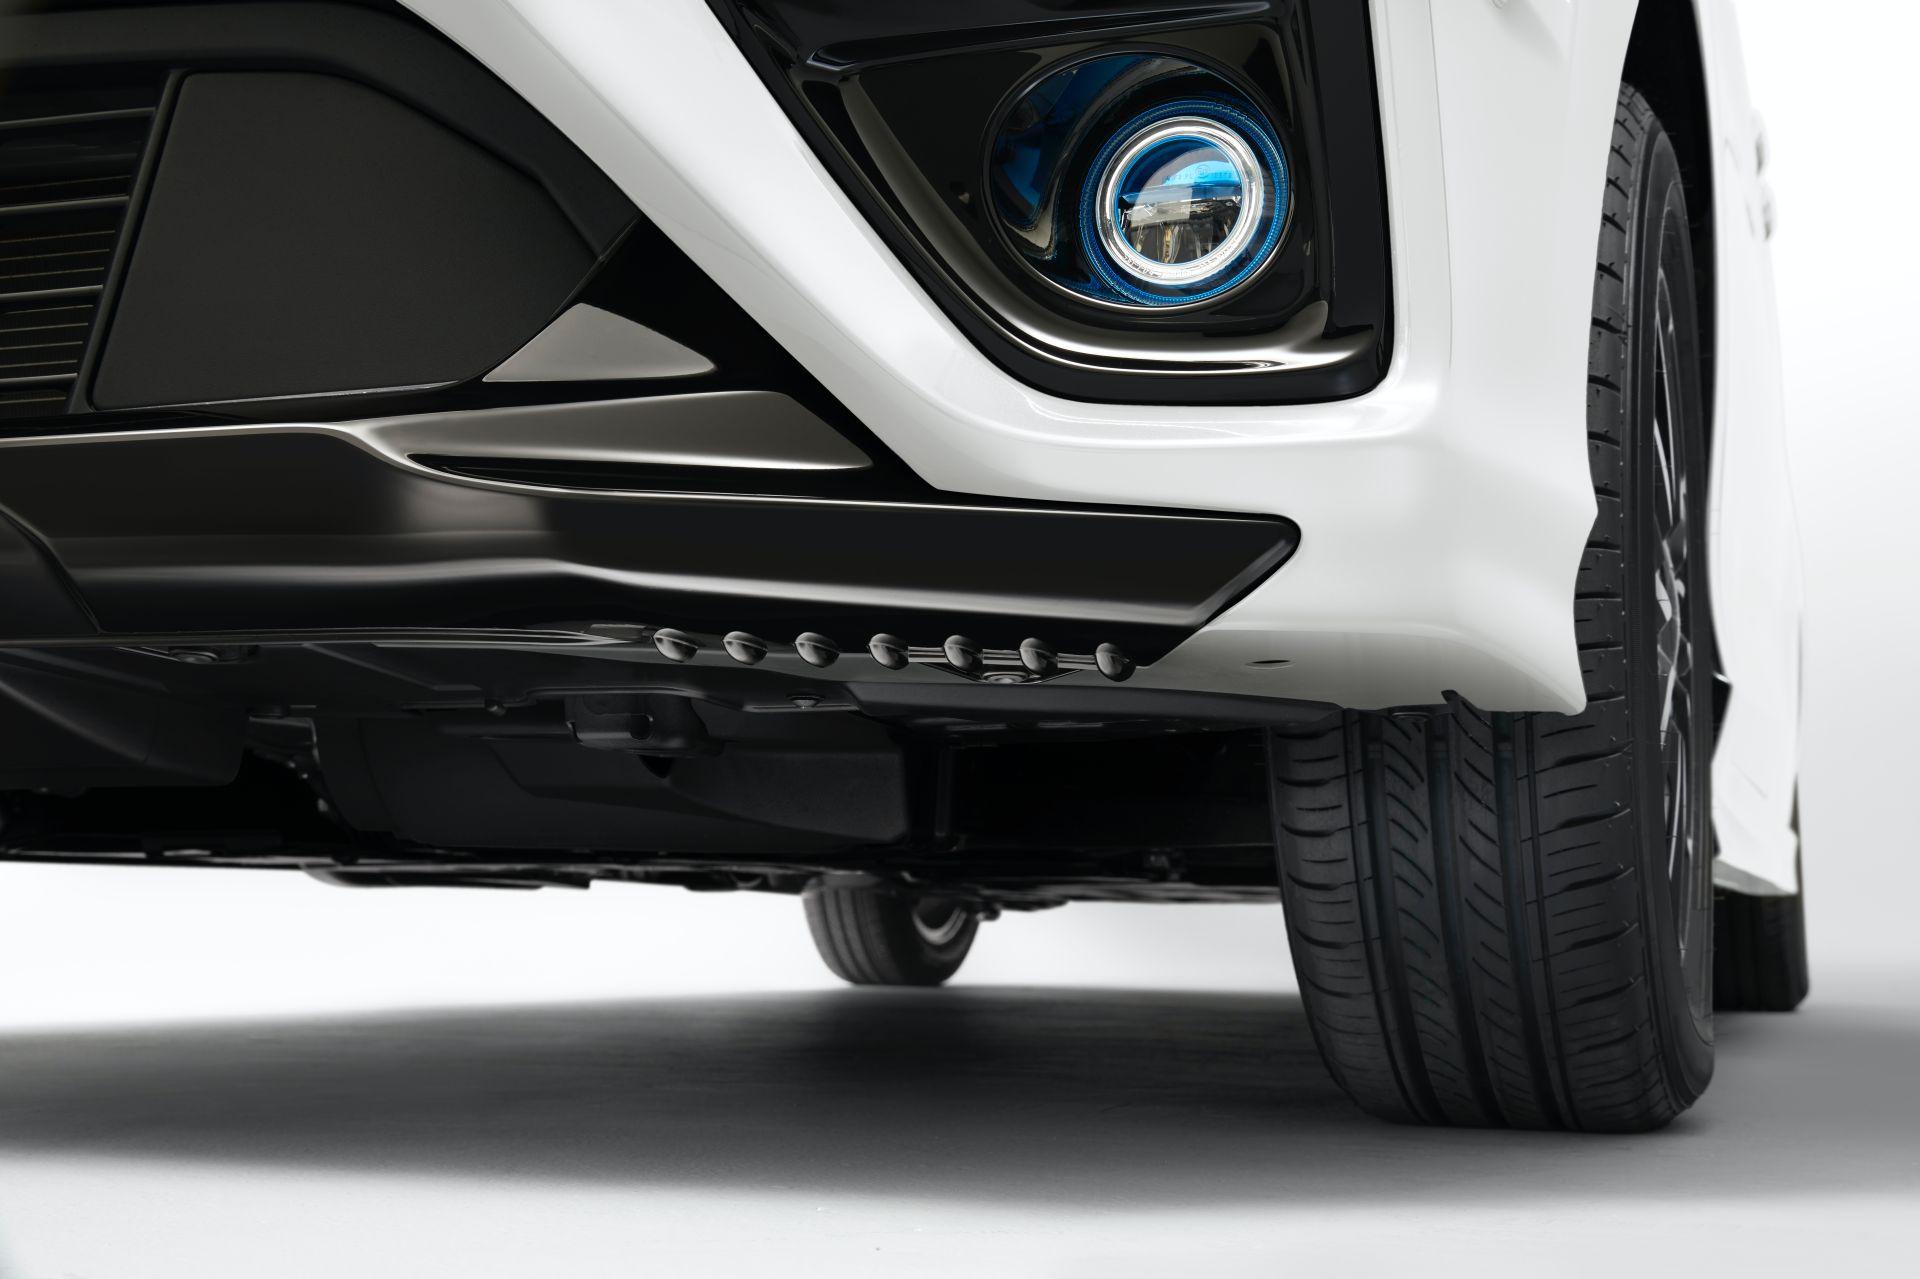 Honda-Freed-Modulo-X-Facelift-2020-8